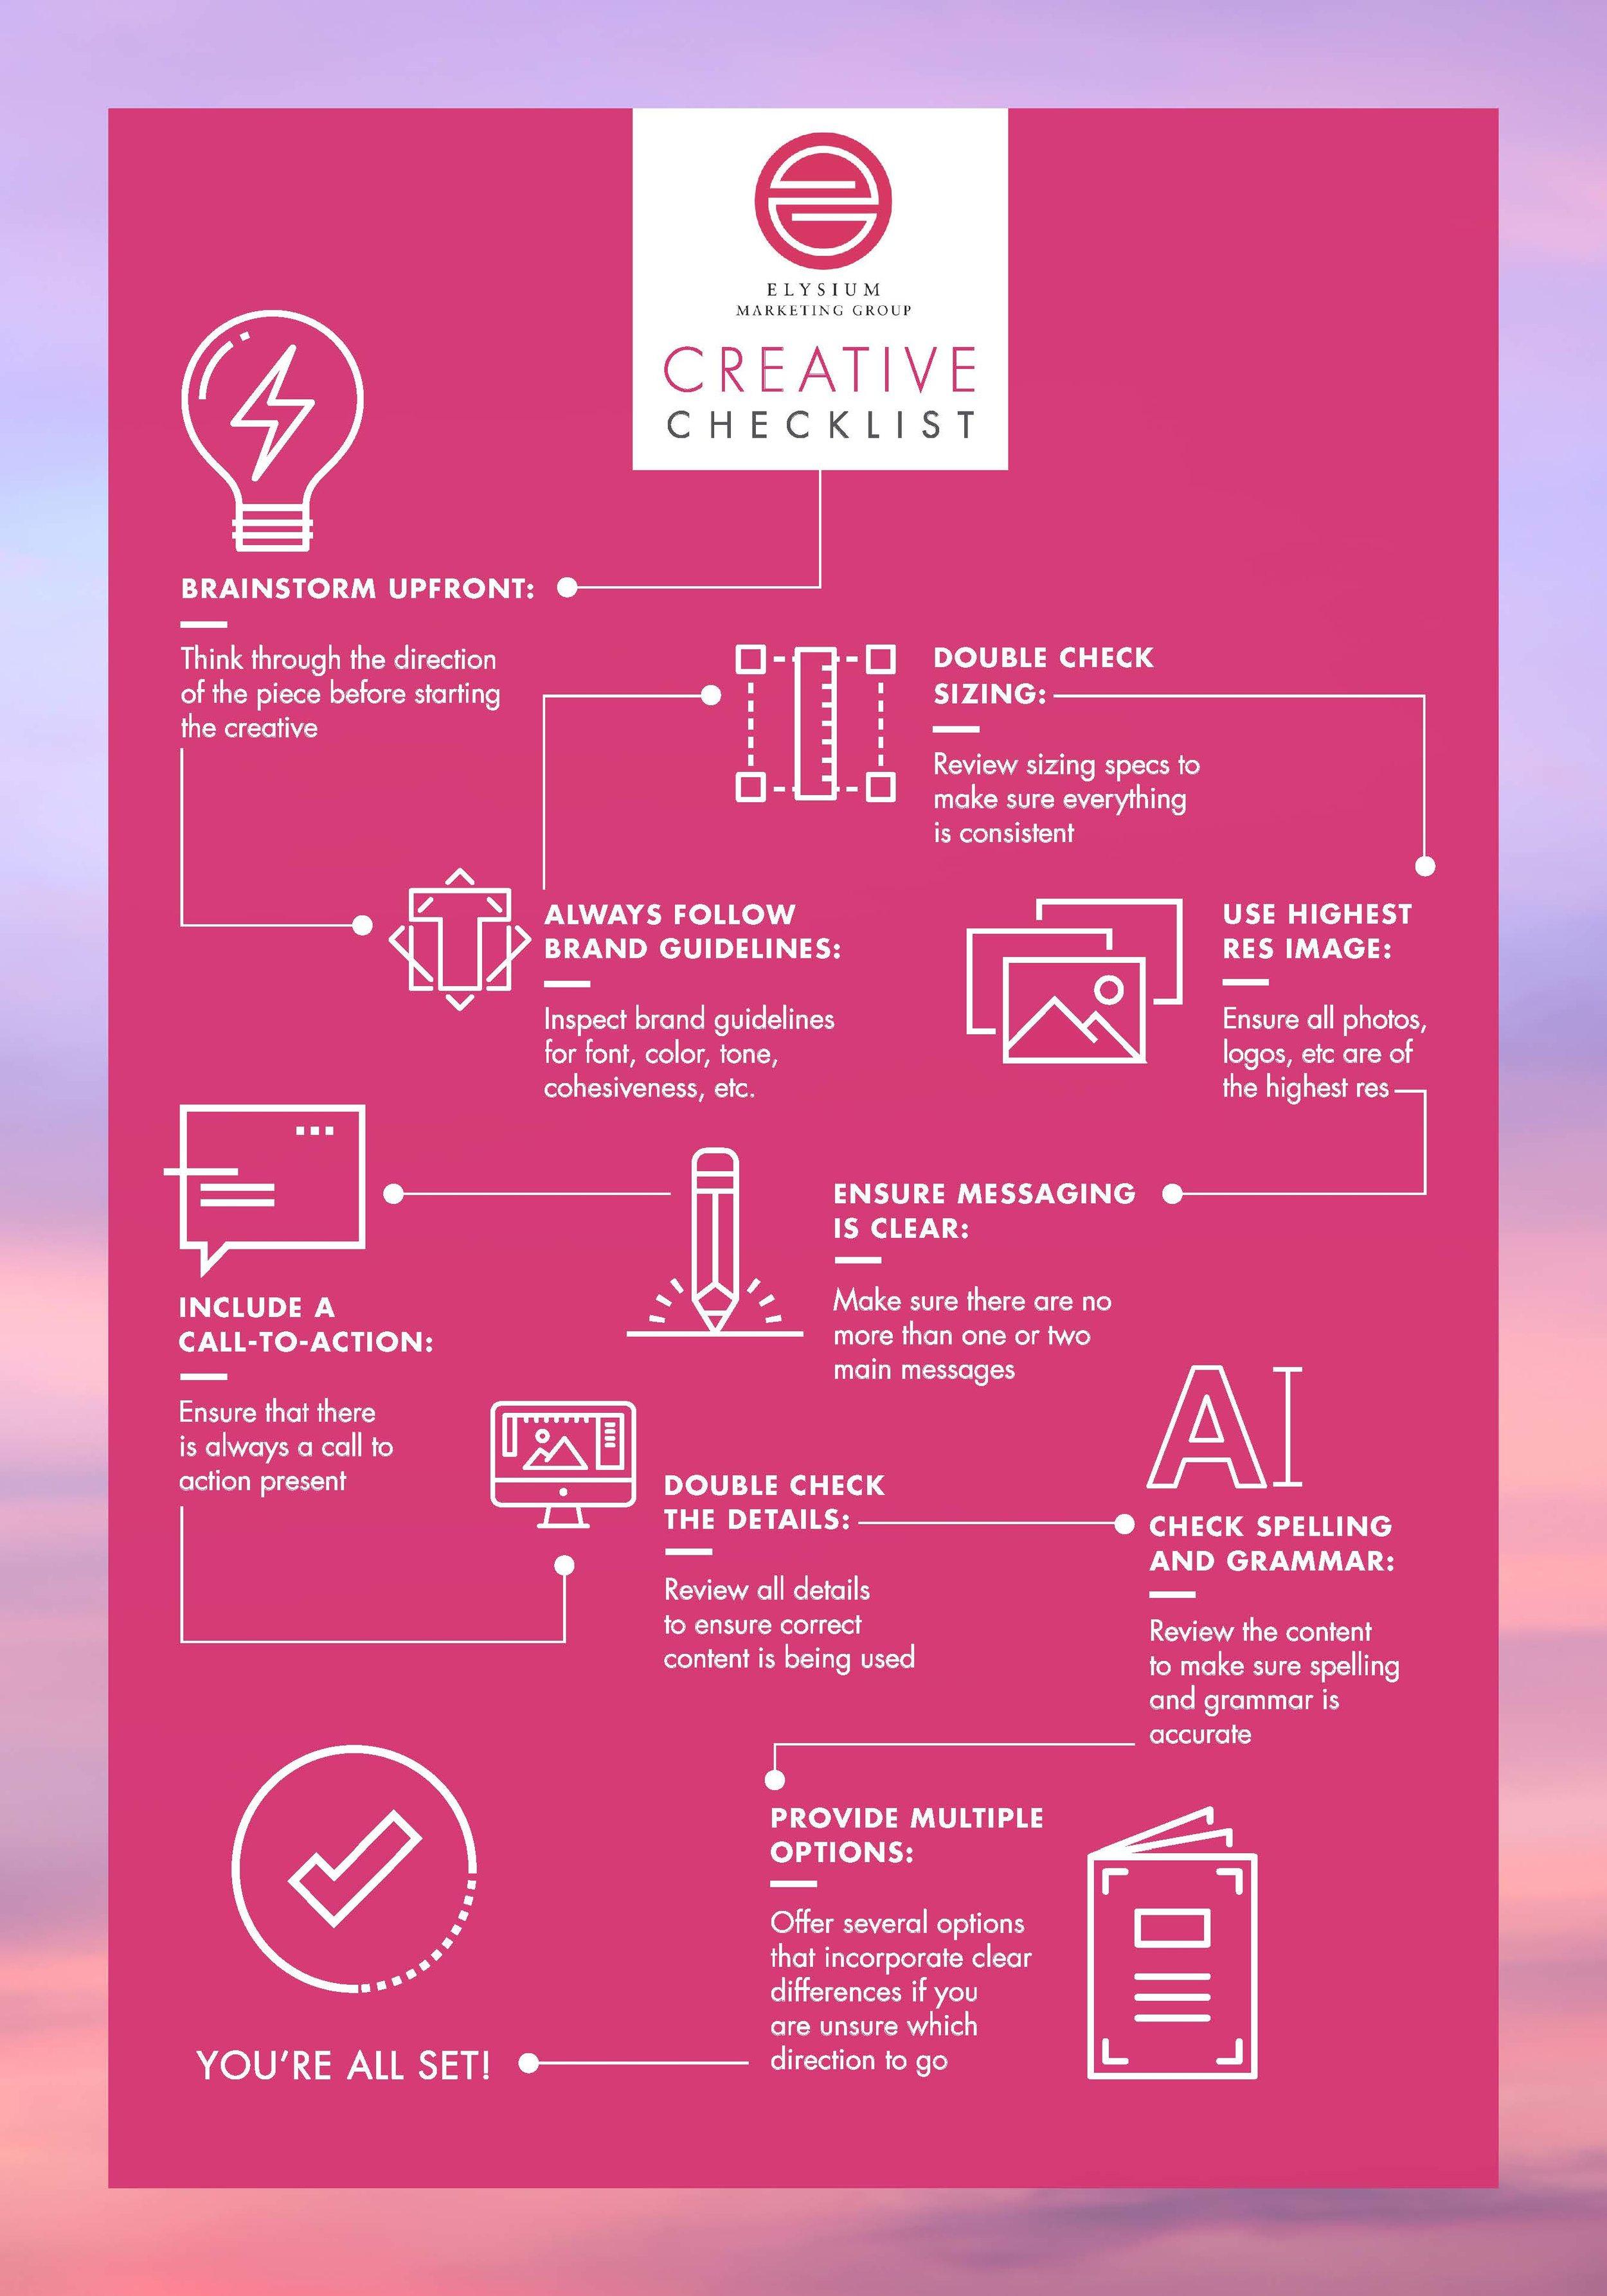 Infographic-Digital-Marketing-Creative-Checklist